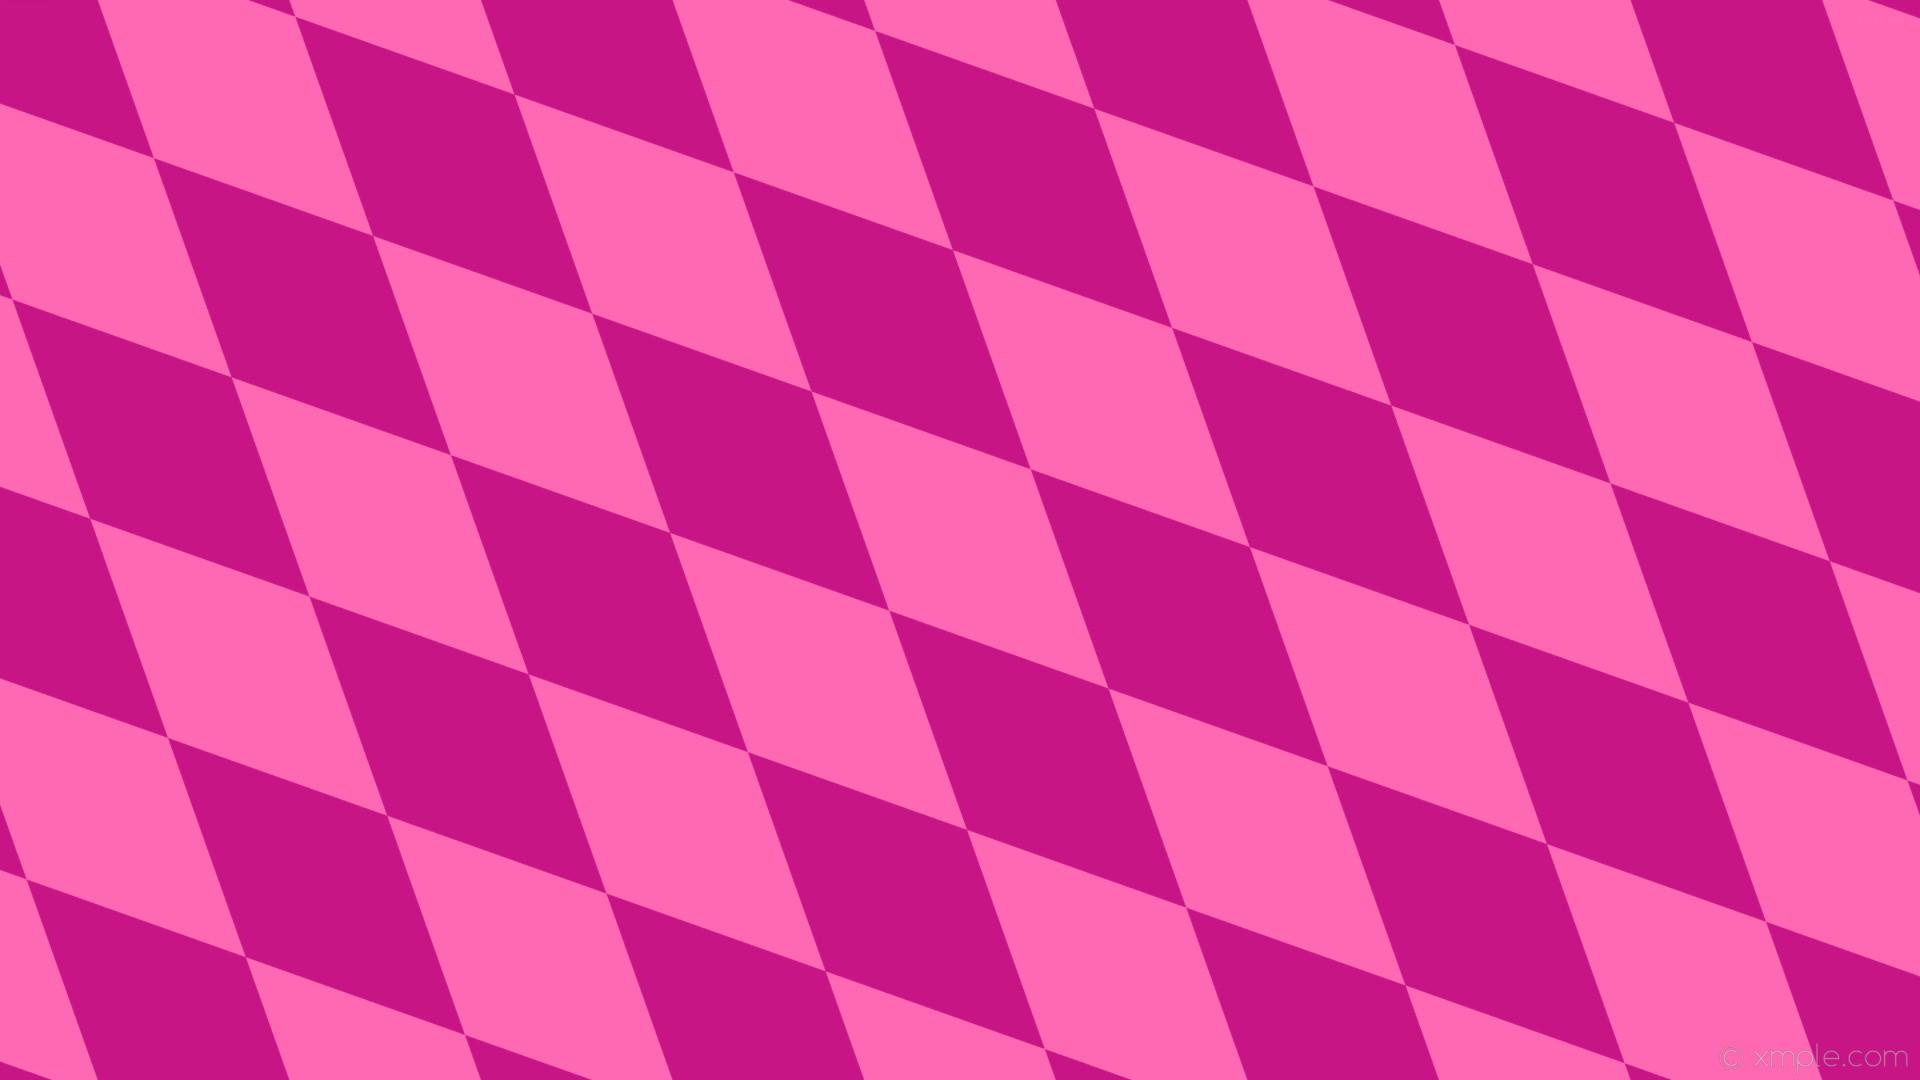 Res: 1920x1080, wallpaper pink diamond lozenge rhombus hot pink medium violet red #ff69b4  #c71585 135°